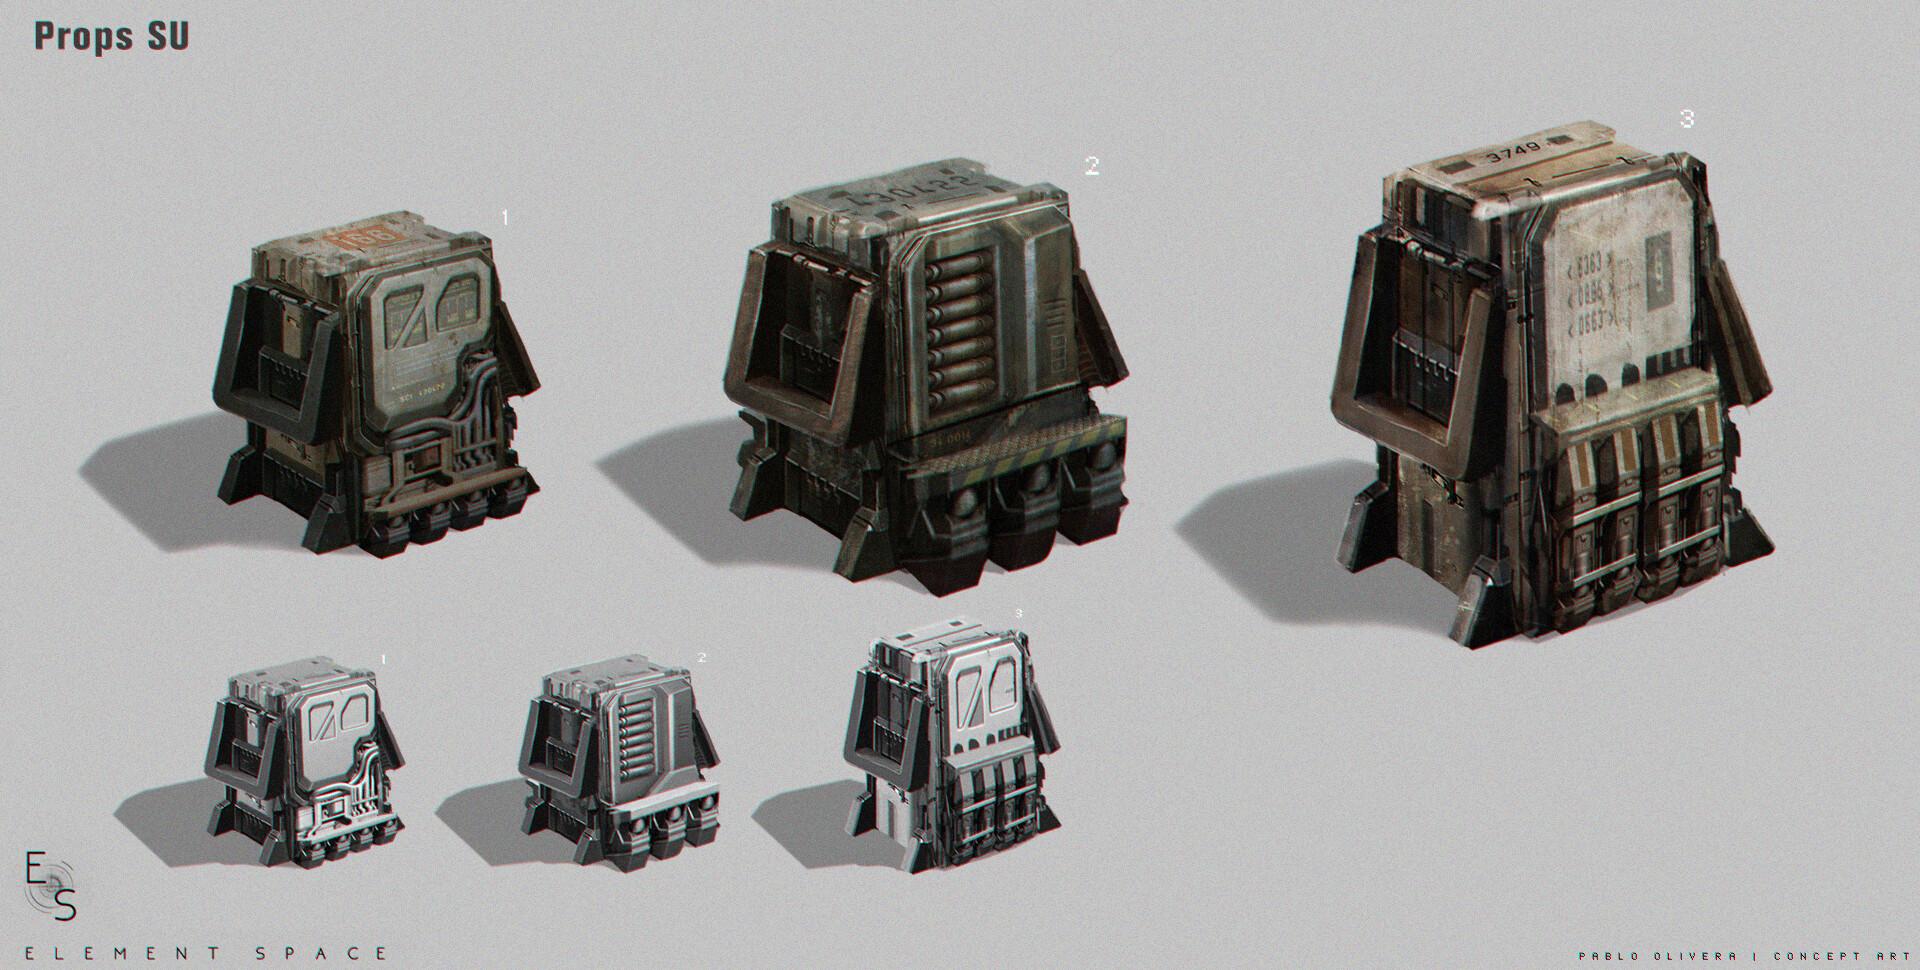 Pablo olivera element space props su machines 02